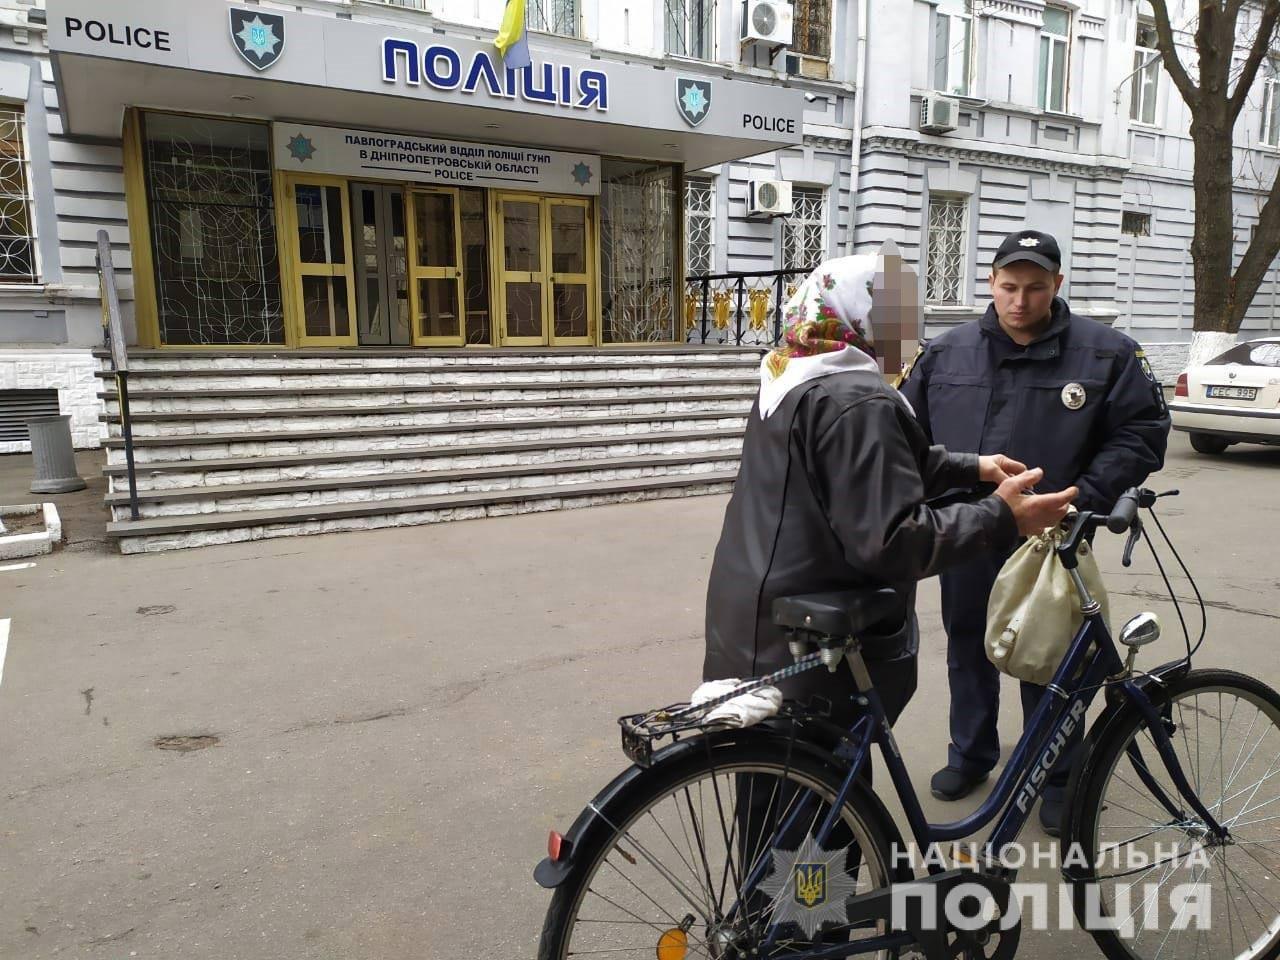 Под Днепром мужчина отобрал велосипед у 78-летней пенсионерки, - ФОТО, фото-1